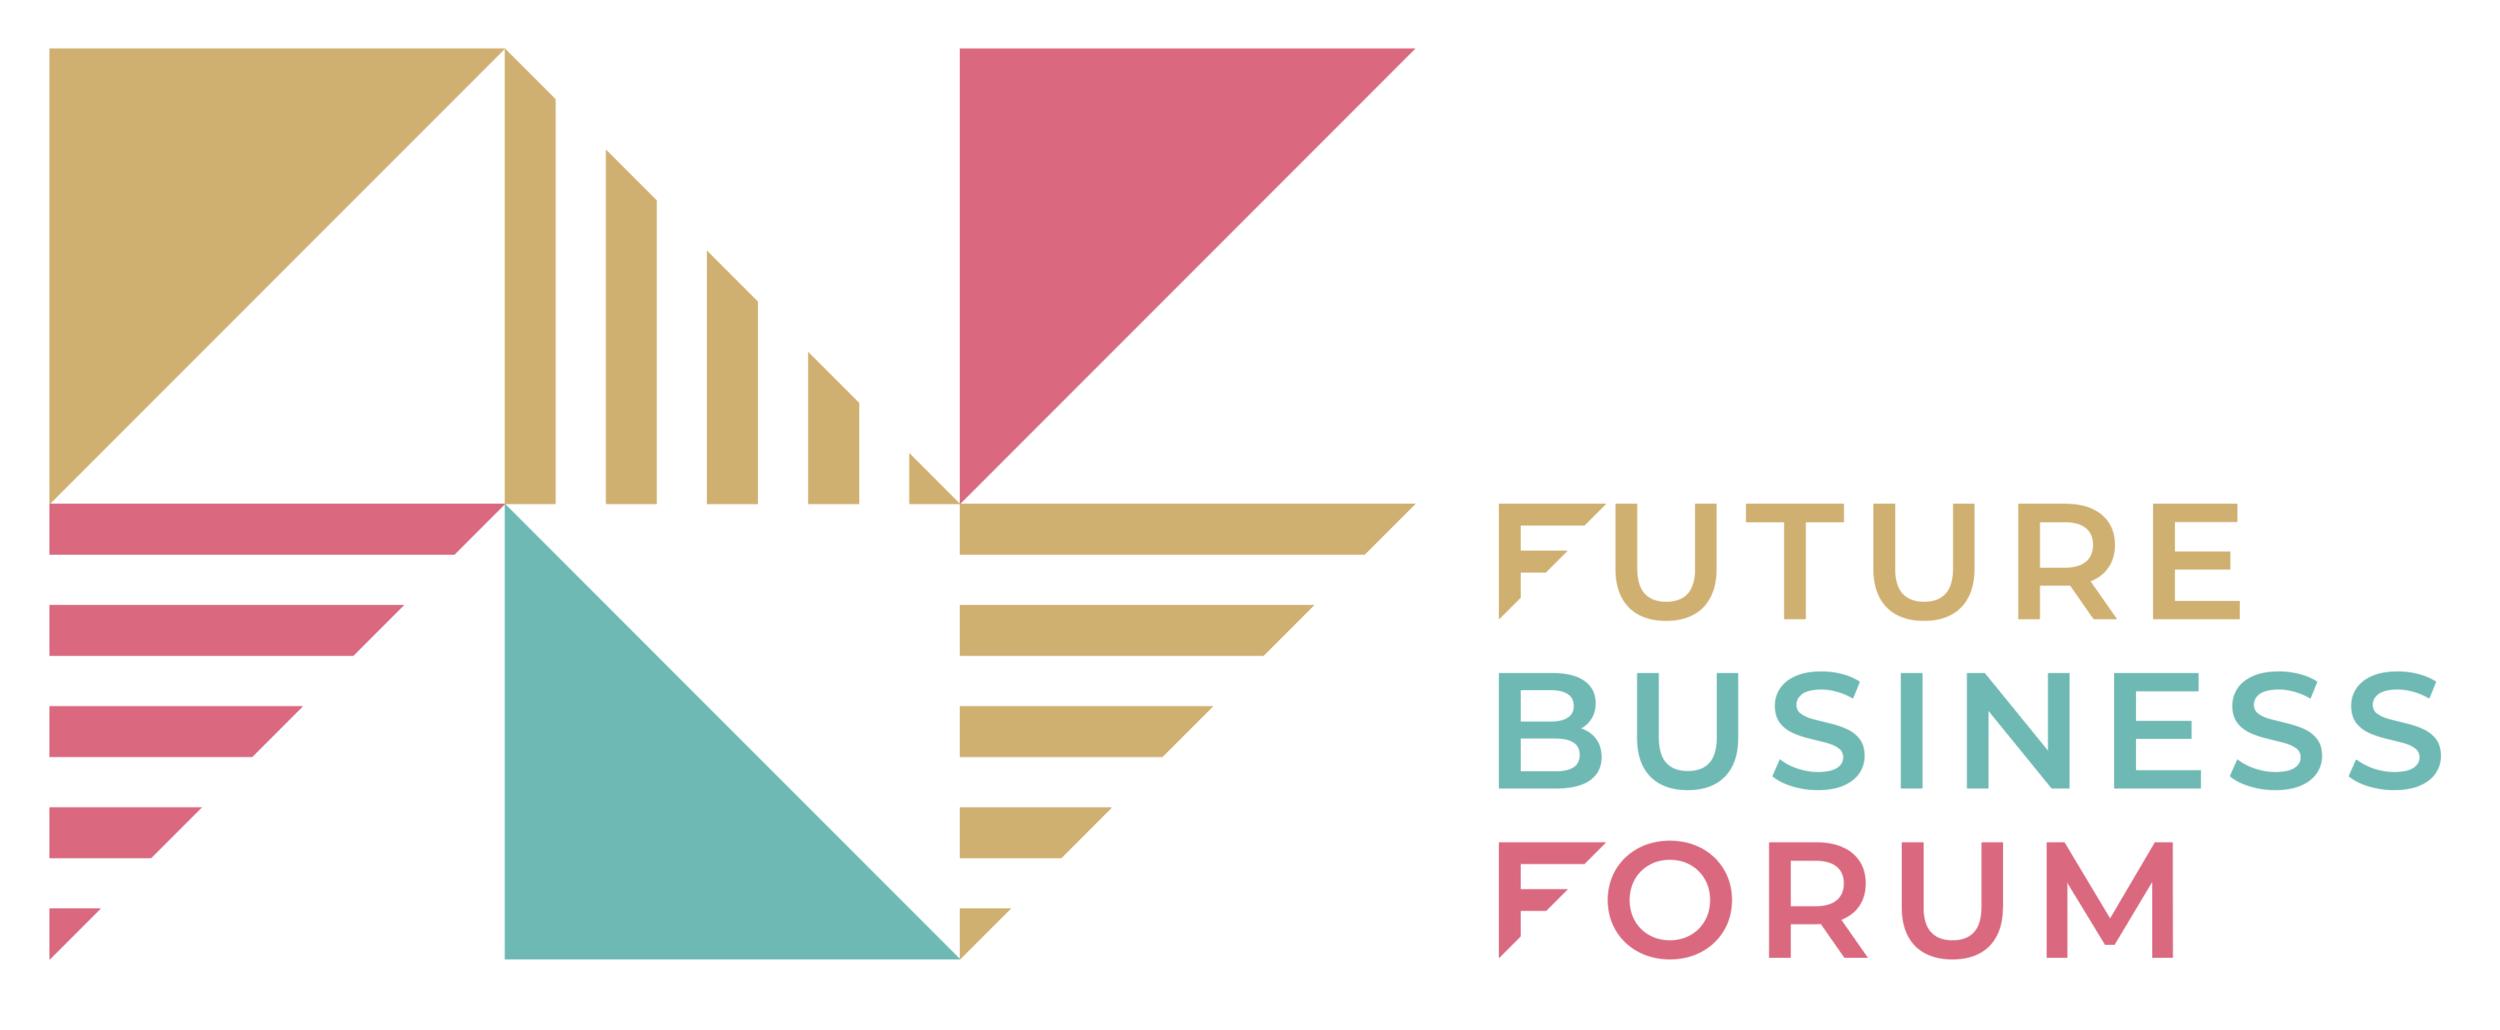 Future Business Forum Identity